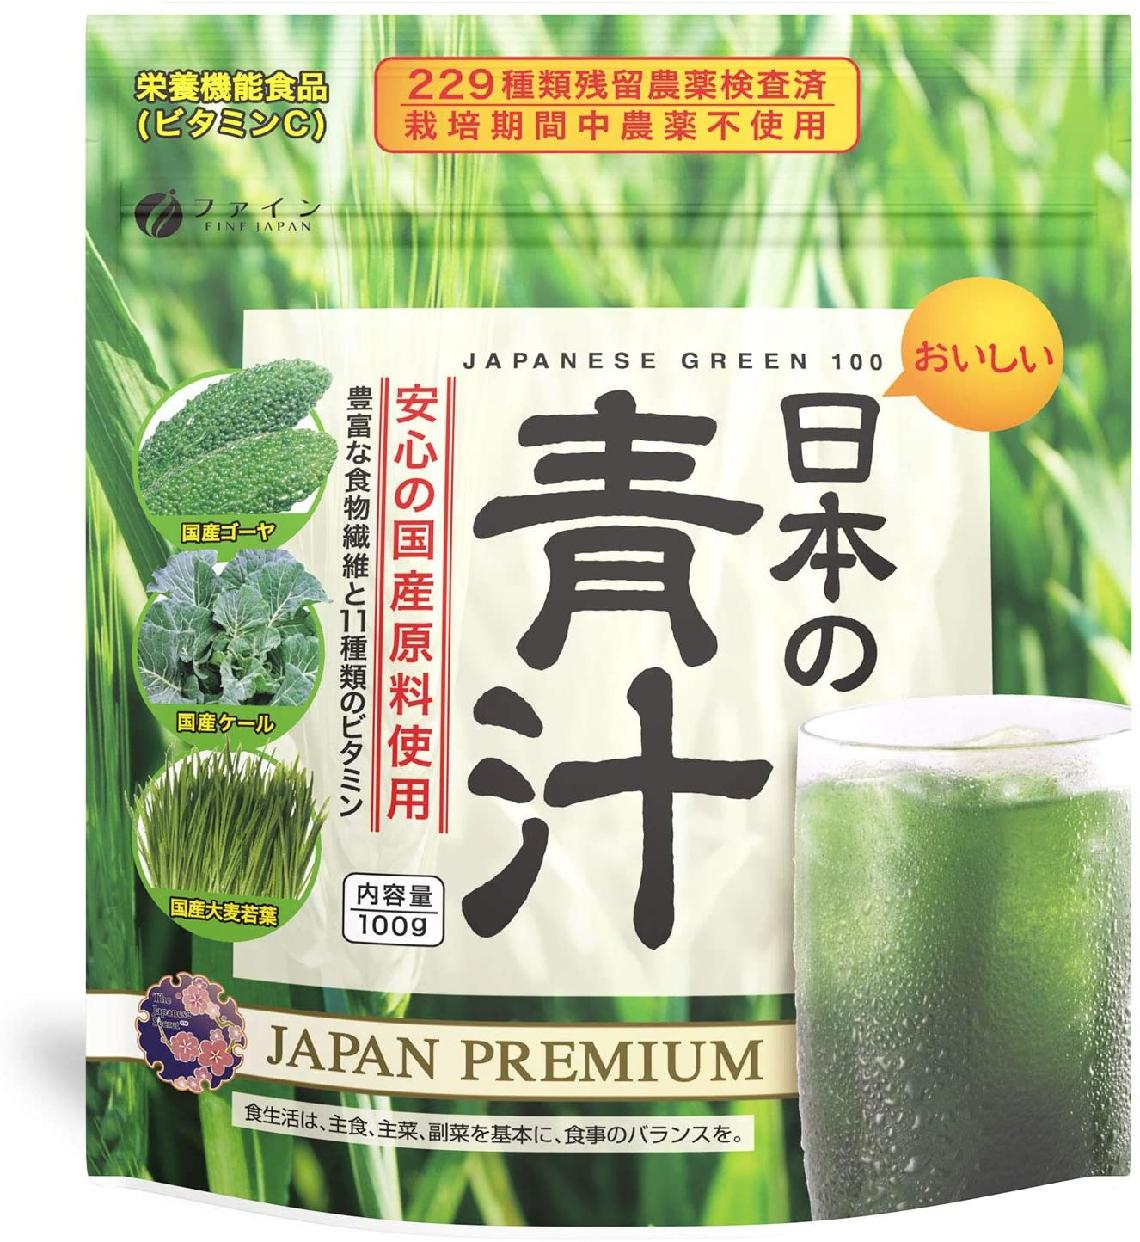 FINE(ファイン) 日本の青汁の商品画像